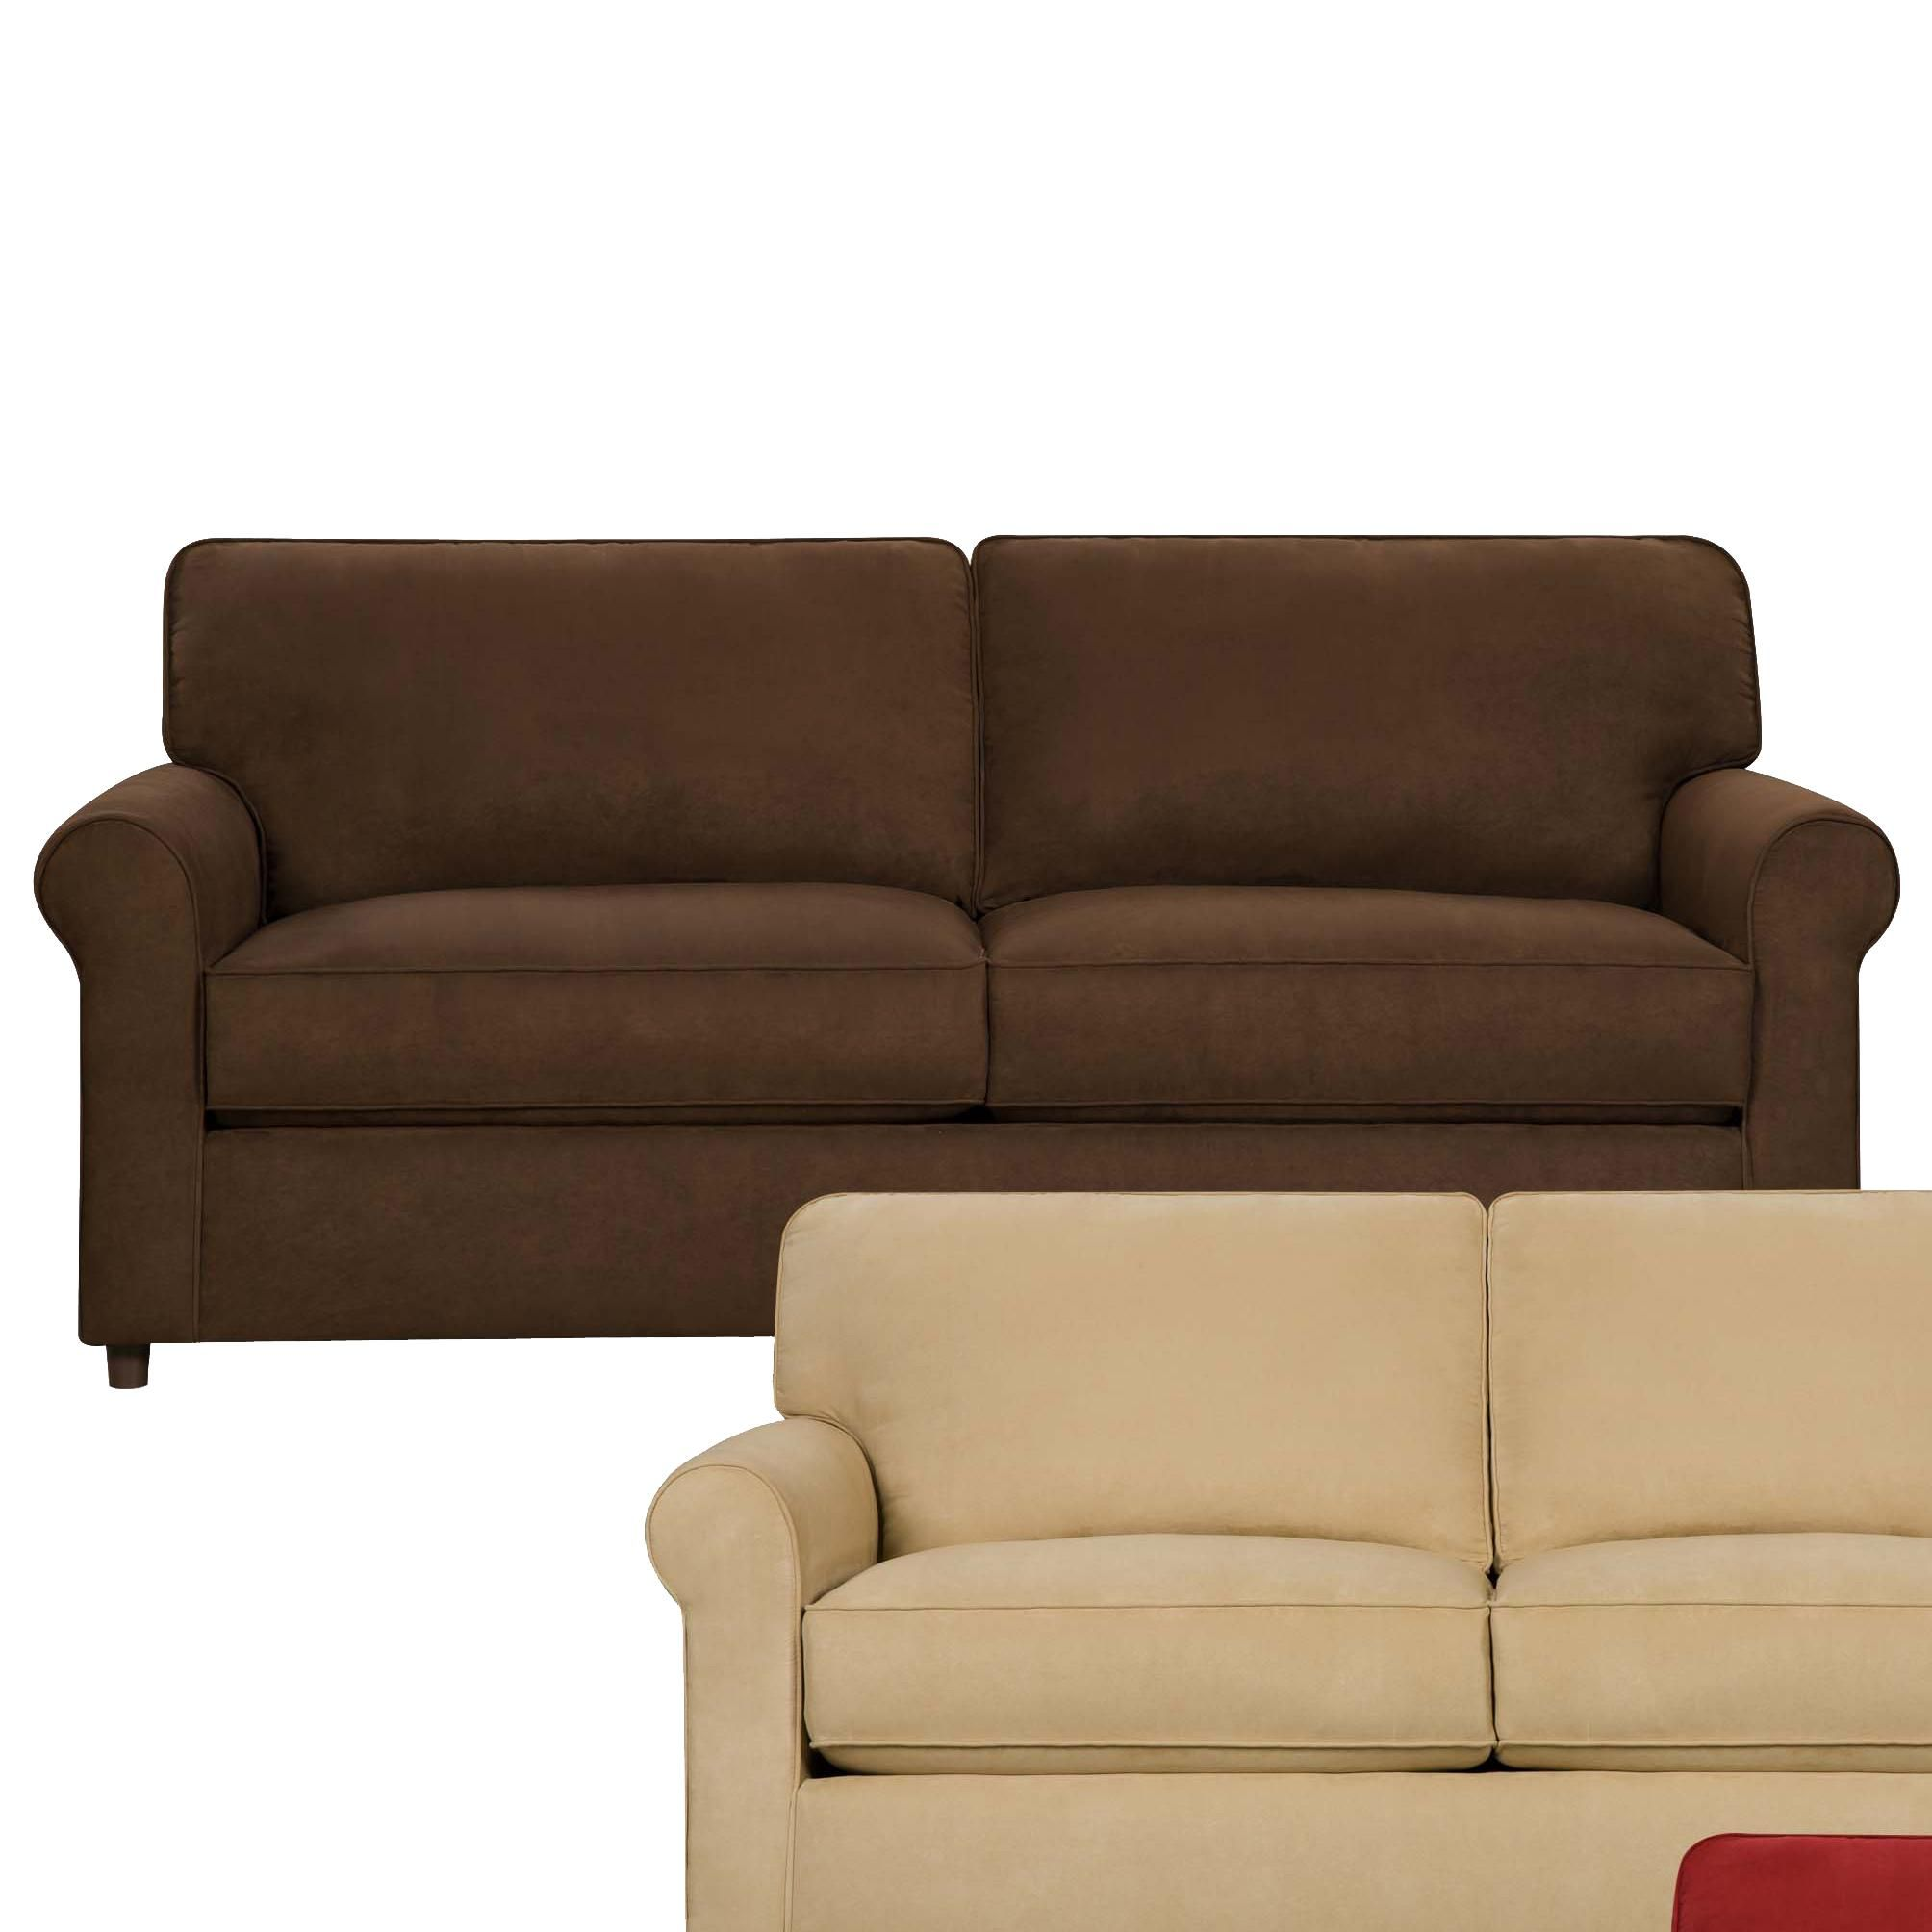 502 Queen Sleeper by Albany   Queen size sleeper sofa ...